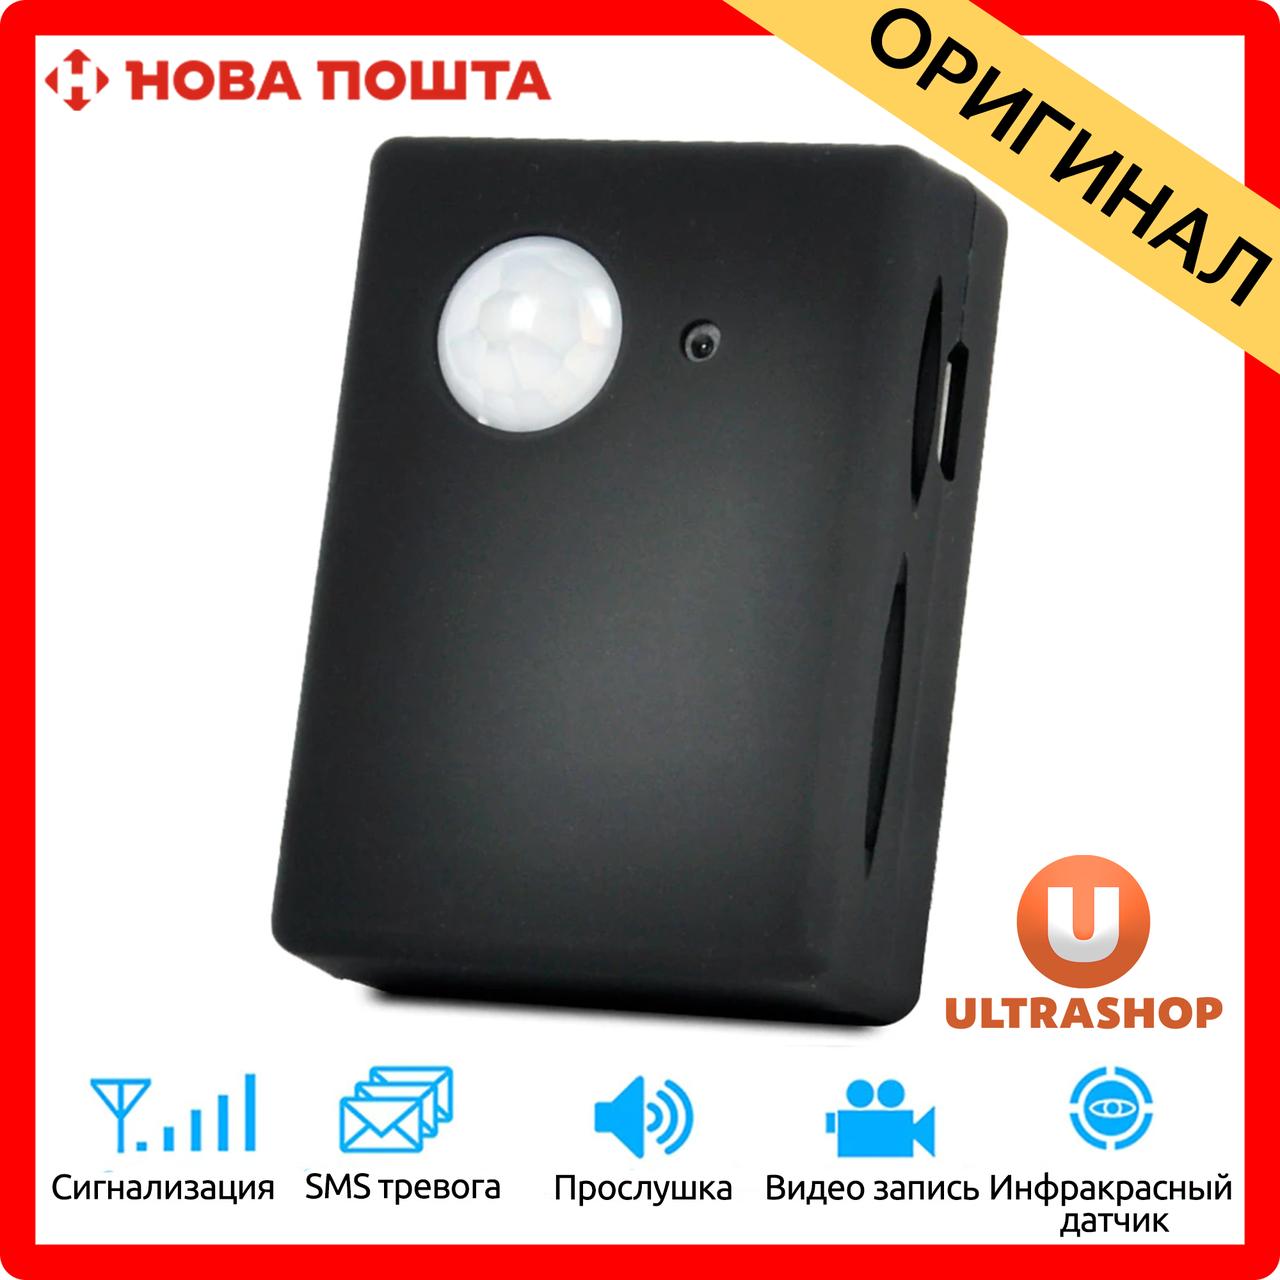 Мини GSM-сигнализация Mini x9009 с датчиком движения, Запись видео и MMS фото, Прослушка, Трекер